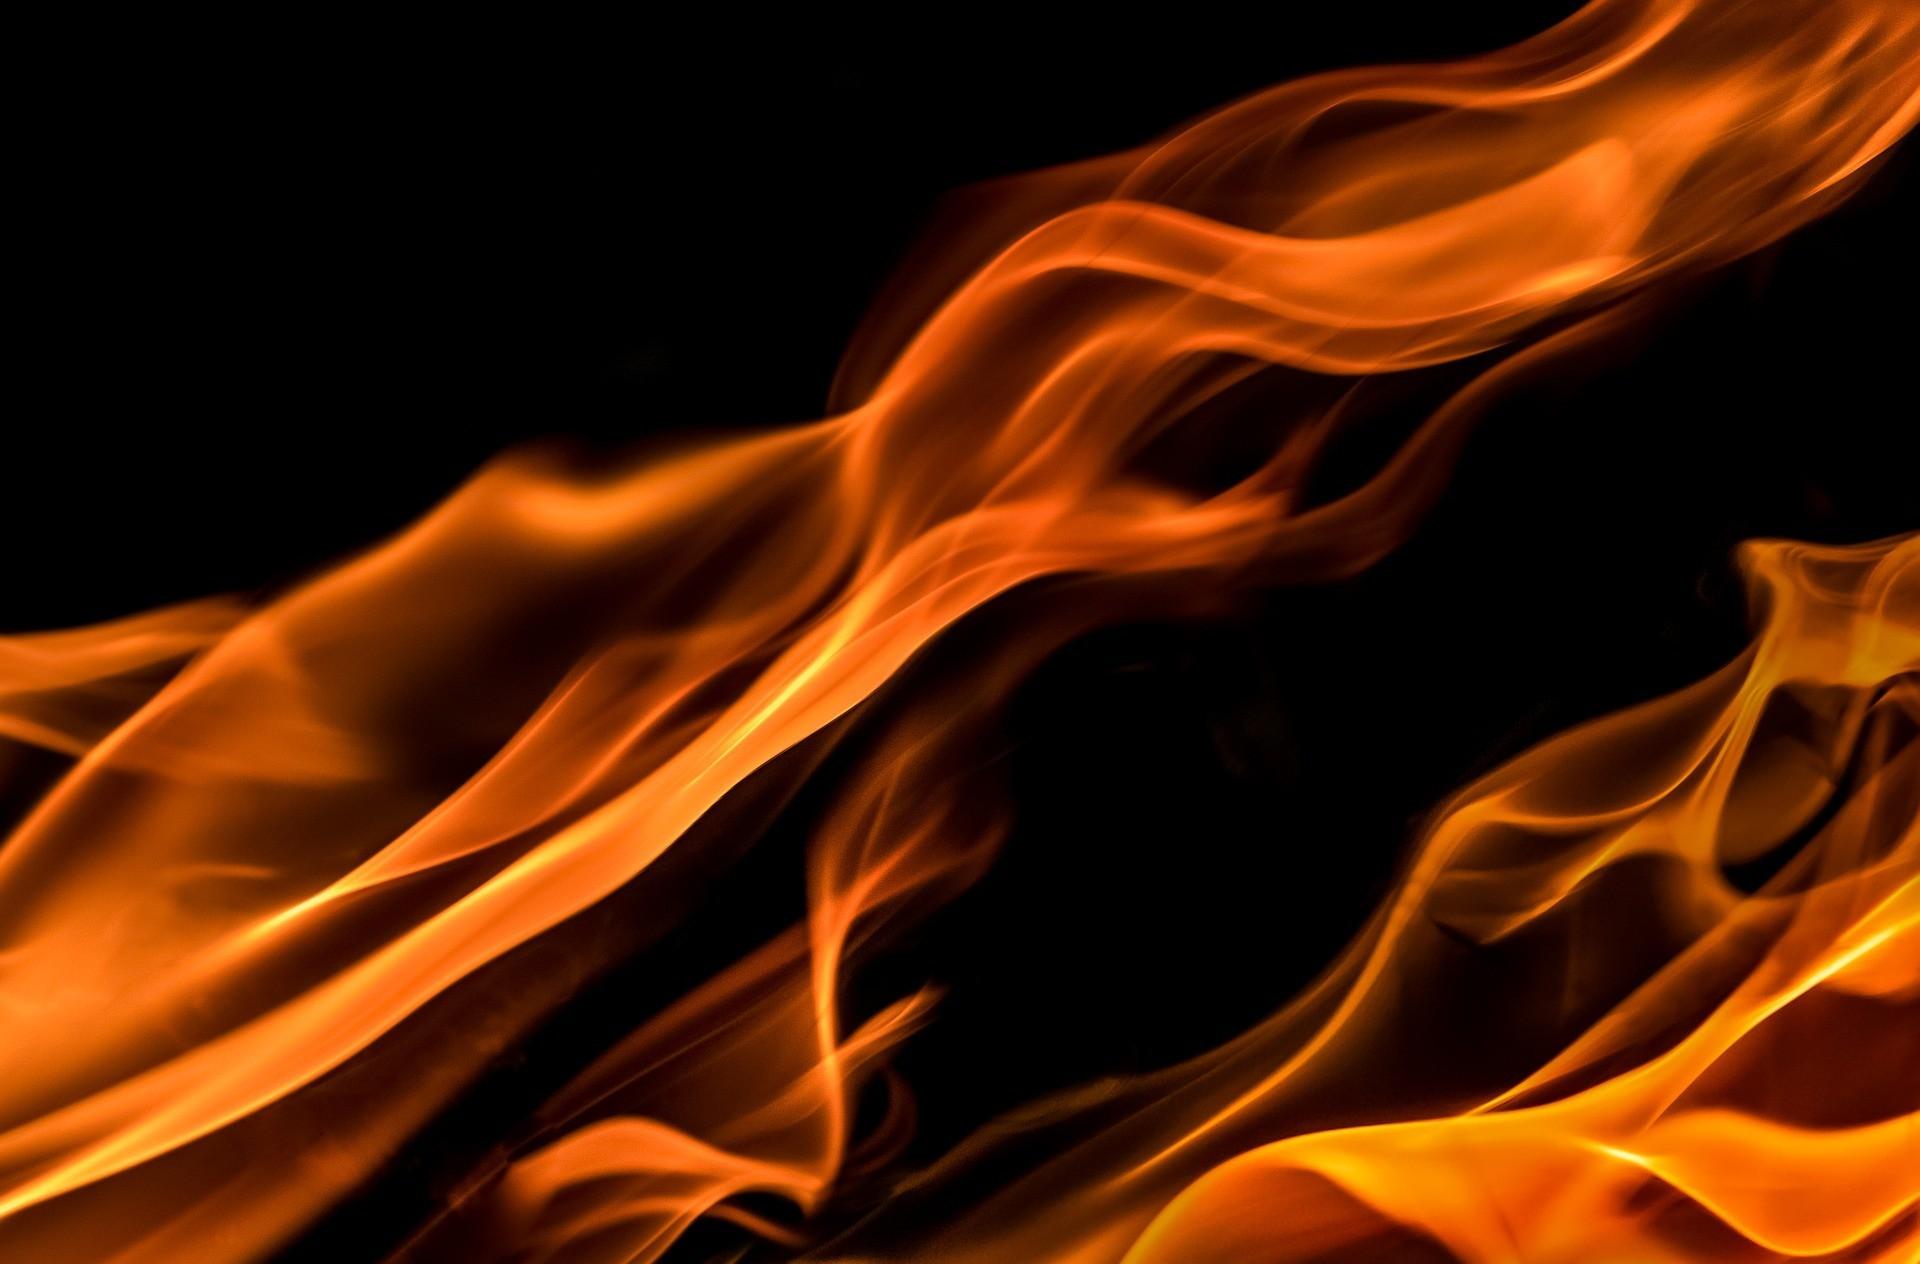 flames 1645399 1920